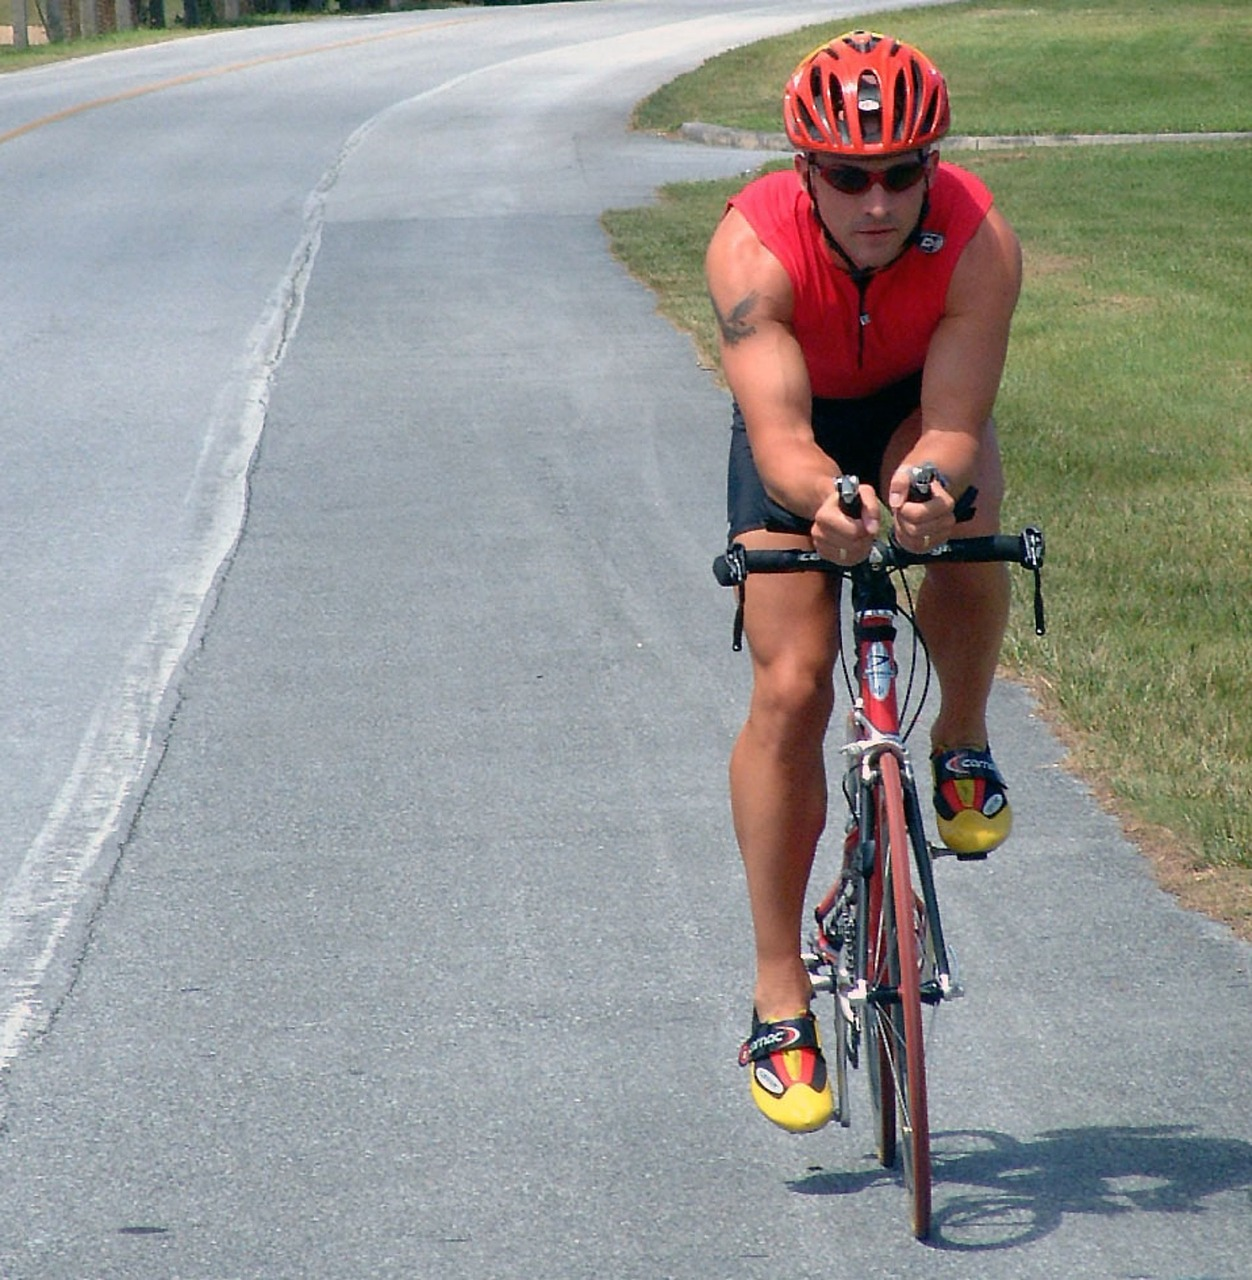 cycling-659806_1280